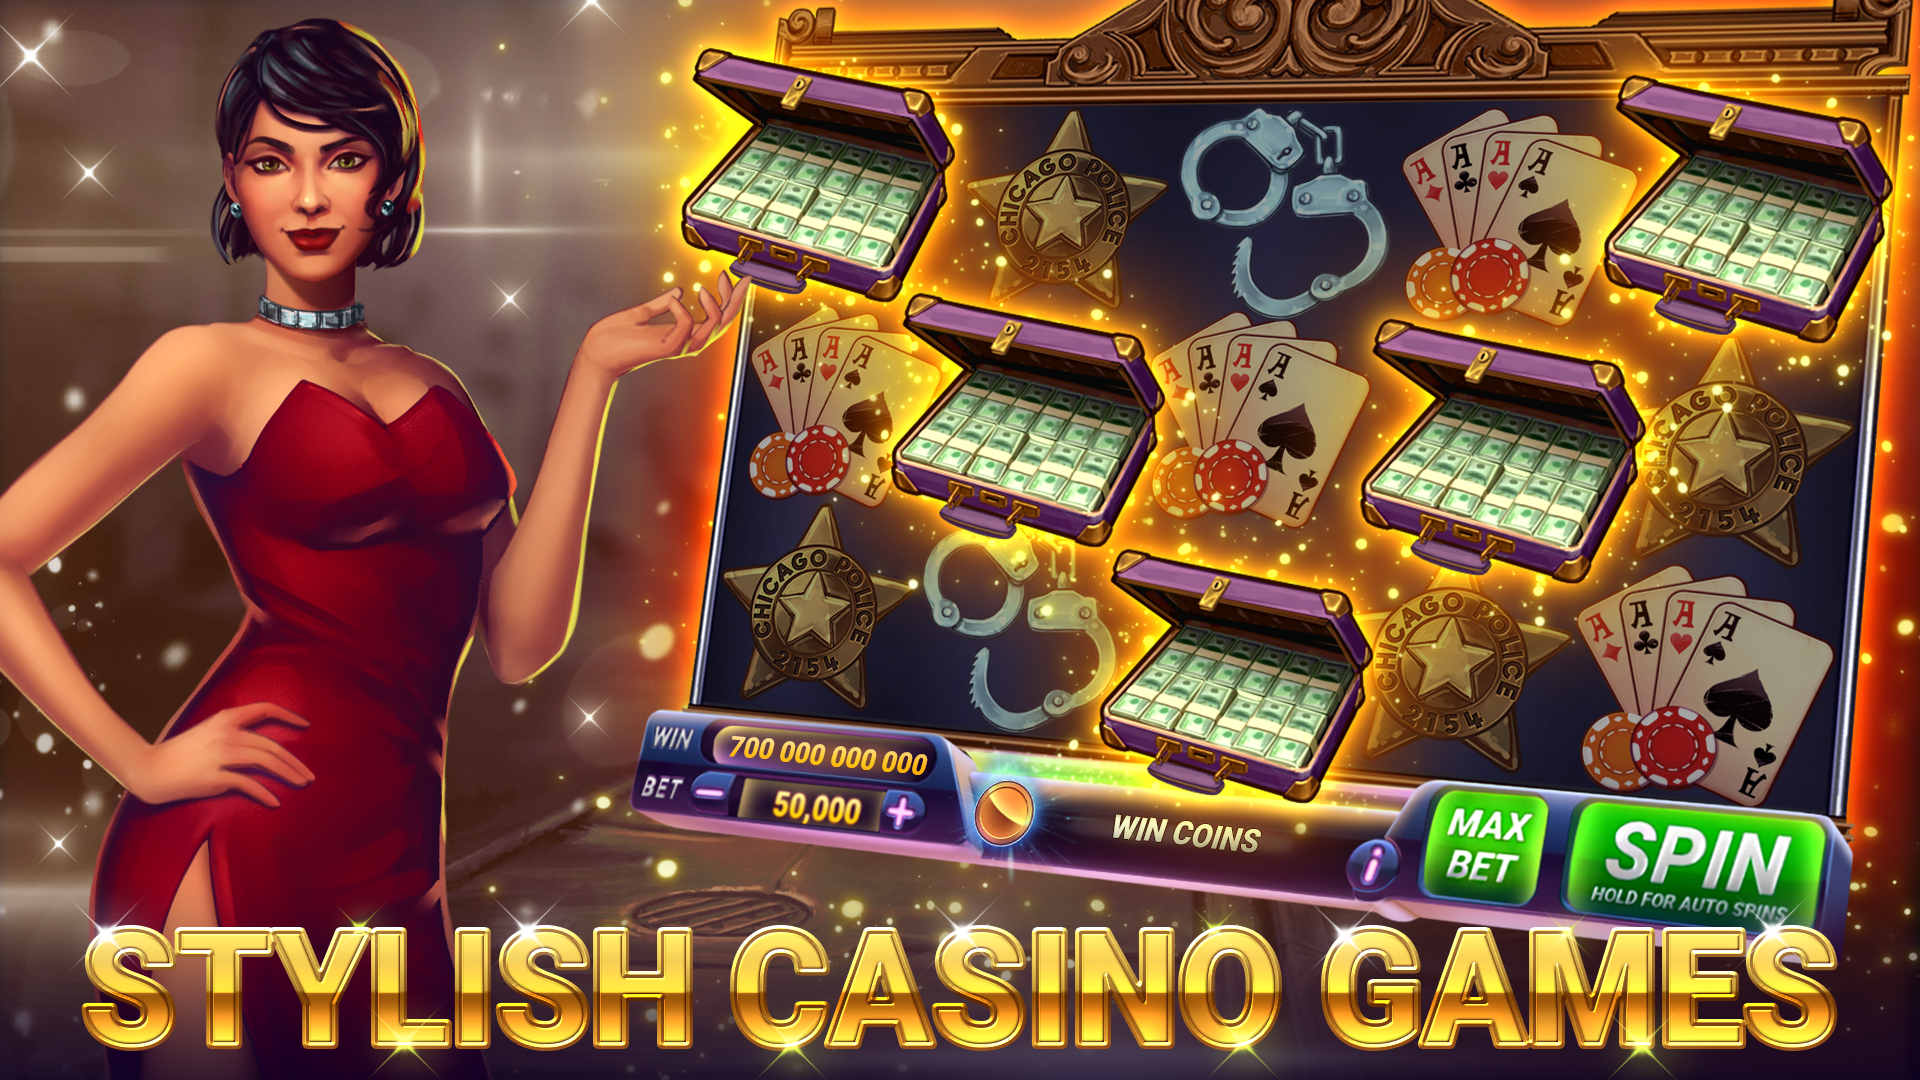 Giochi Slot Machine Gratis Nuovi